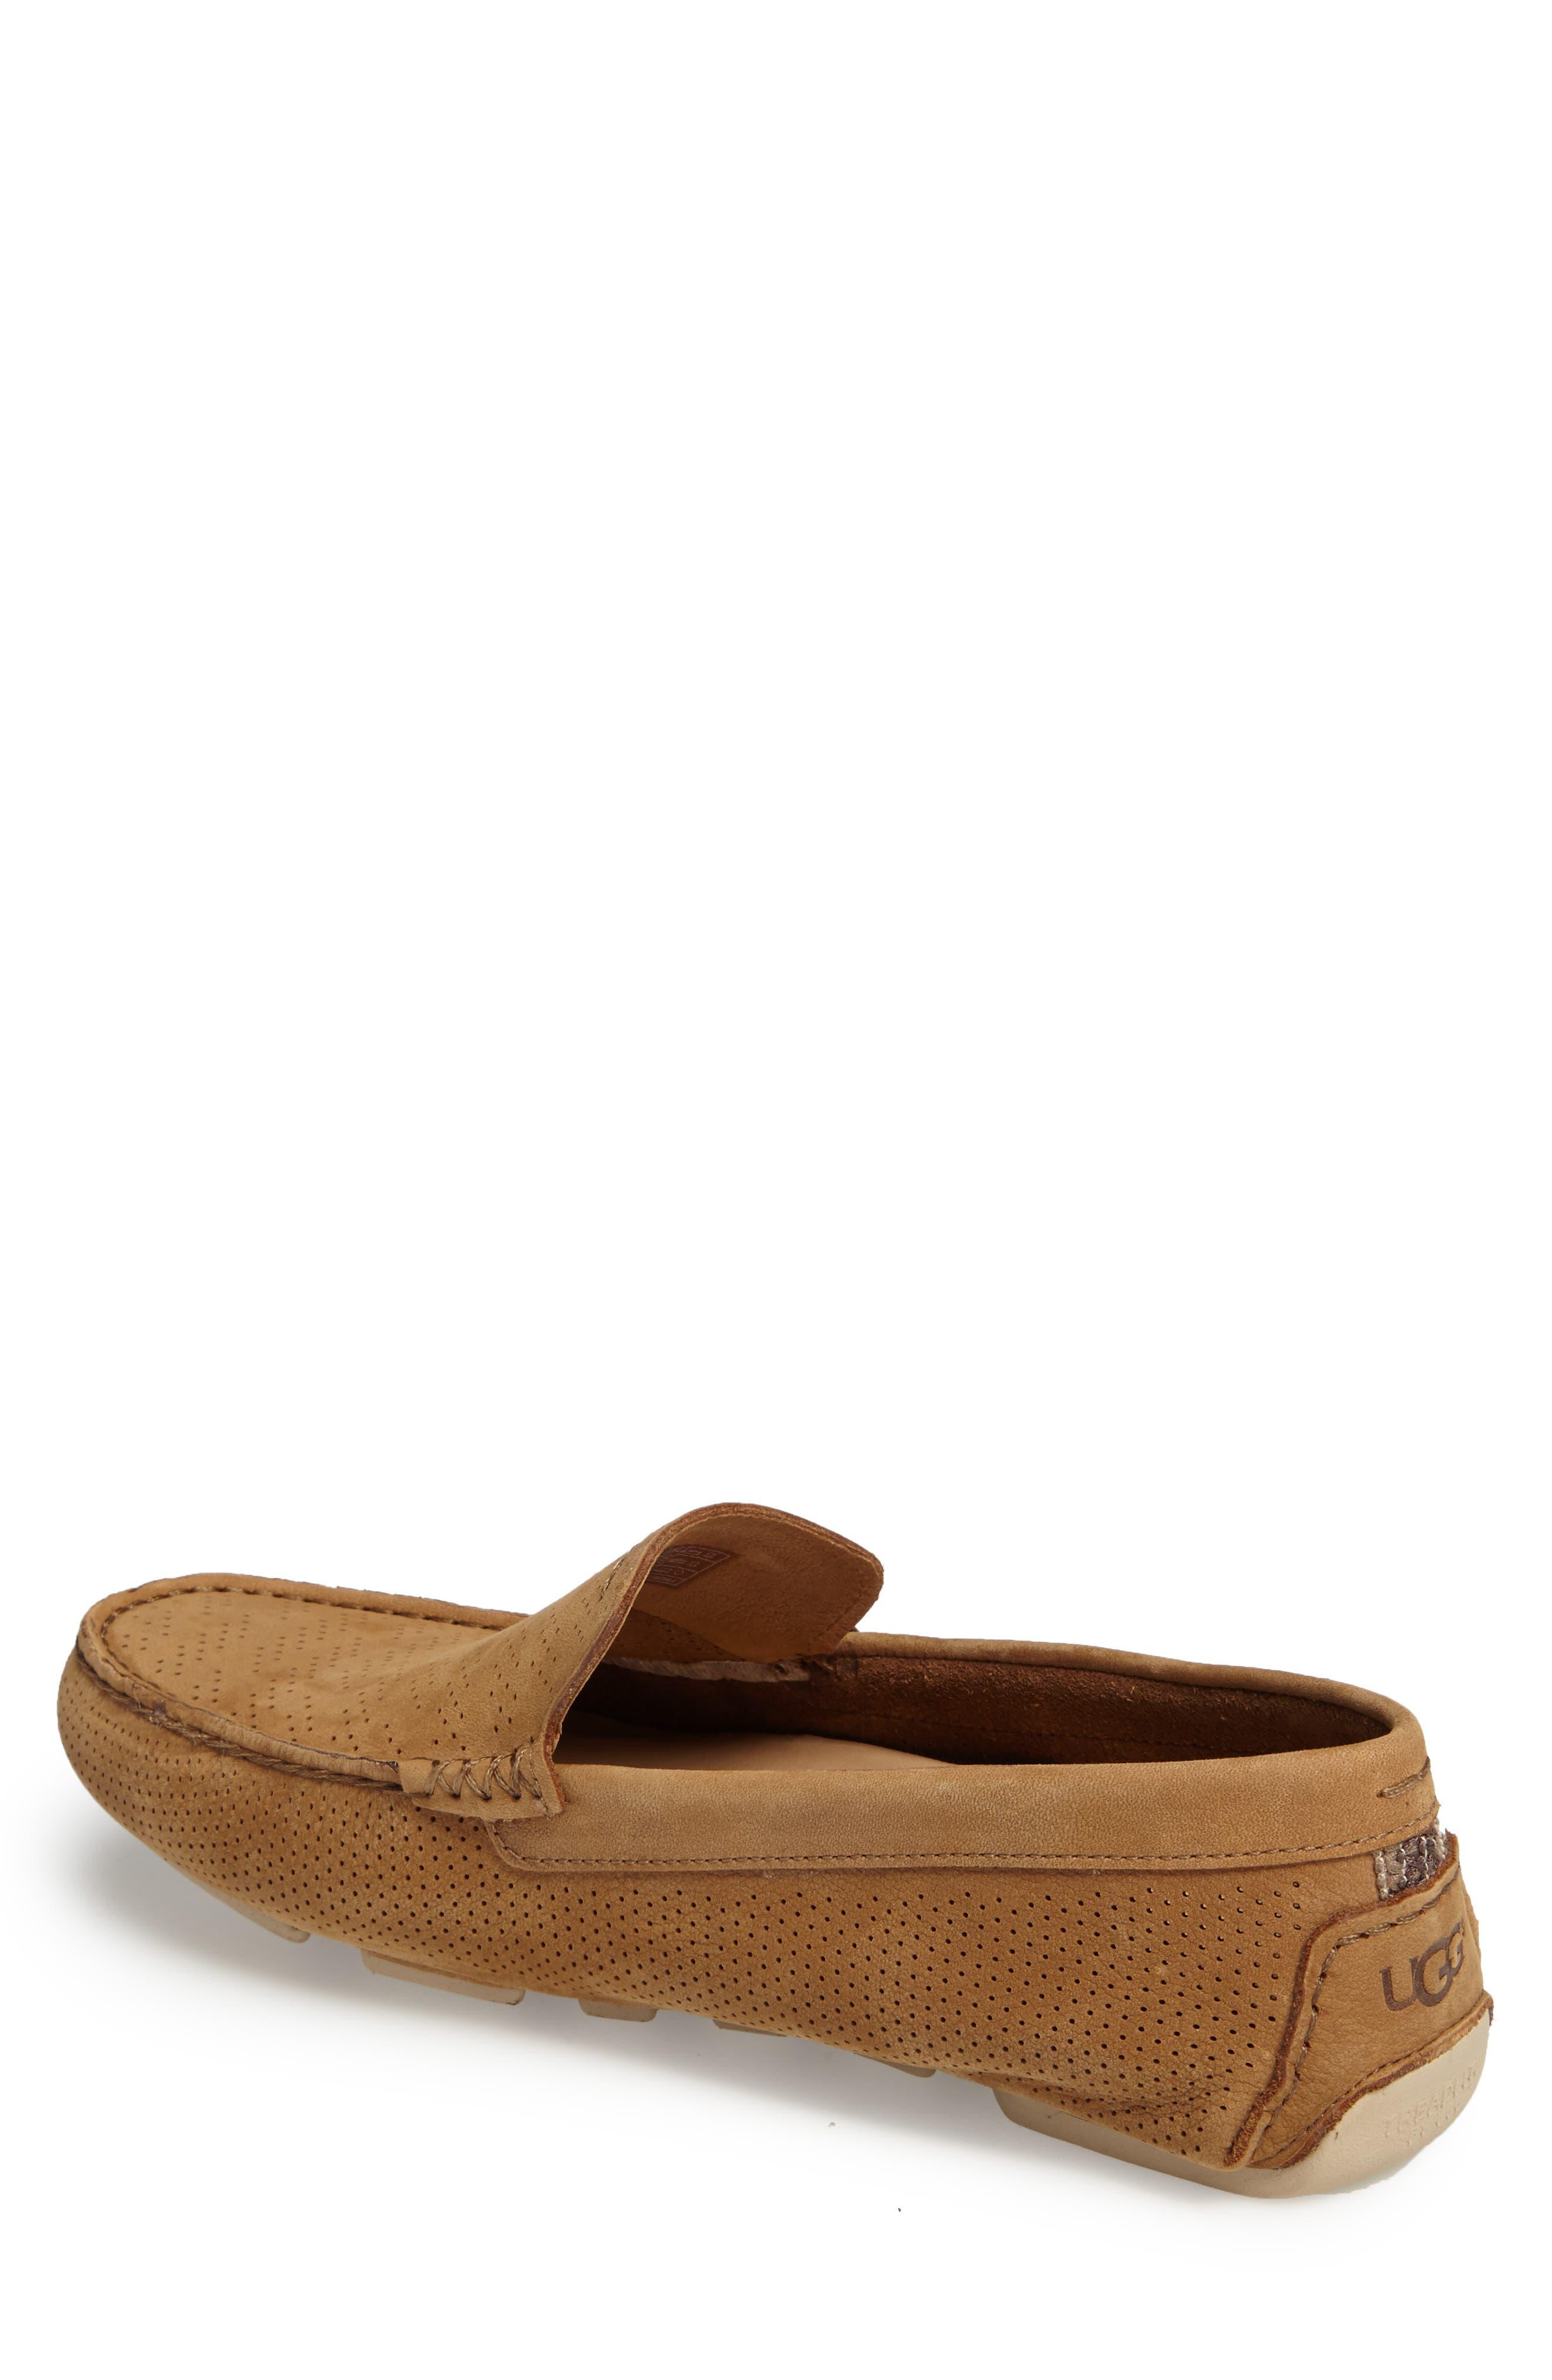 Henrick Twinsole<sup>®</sup> Driving Shoe,                             Alternate thumbnail 2, color,                             Tamarind